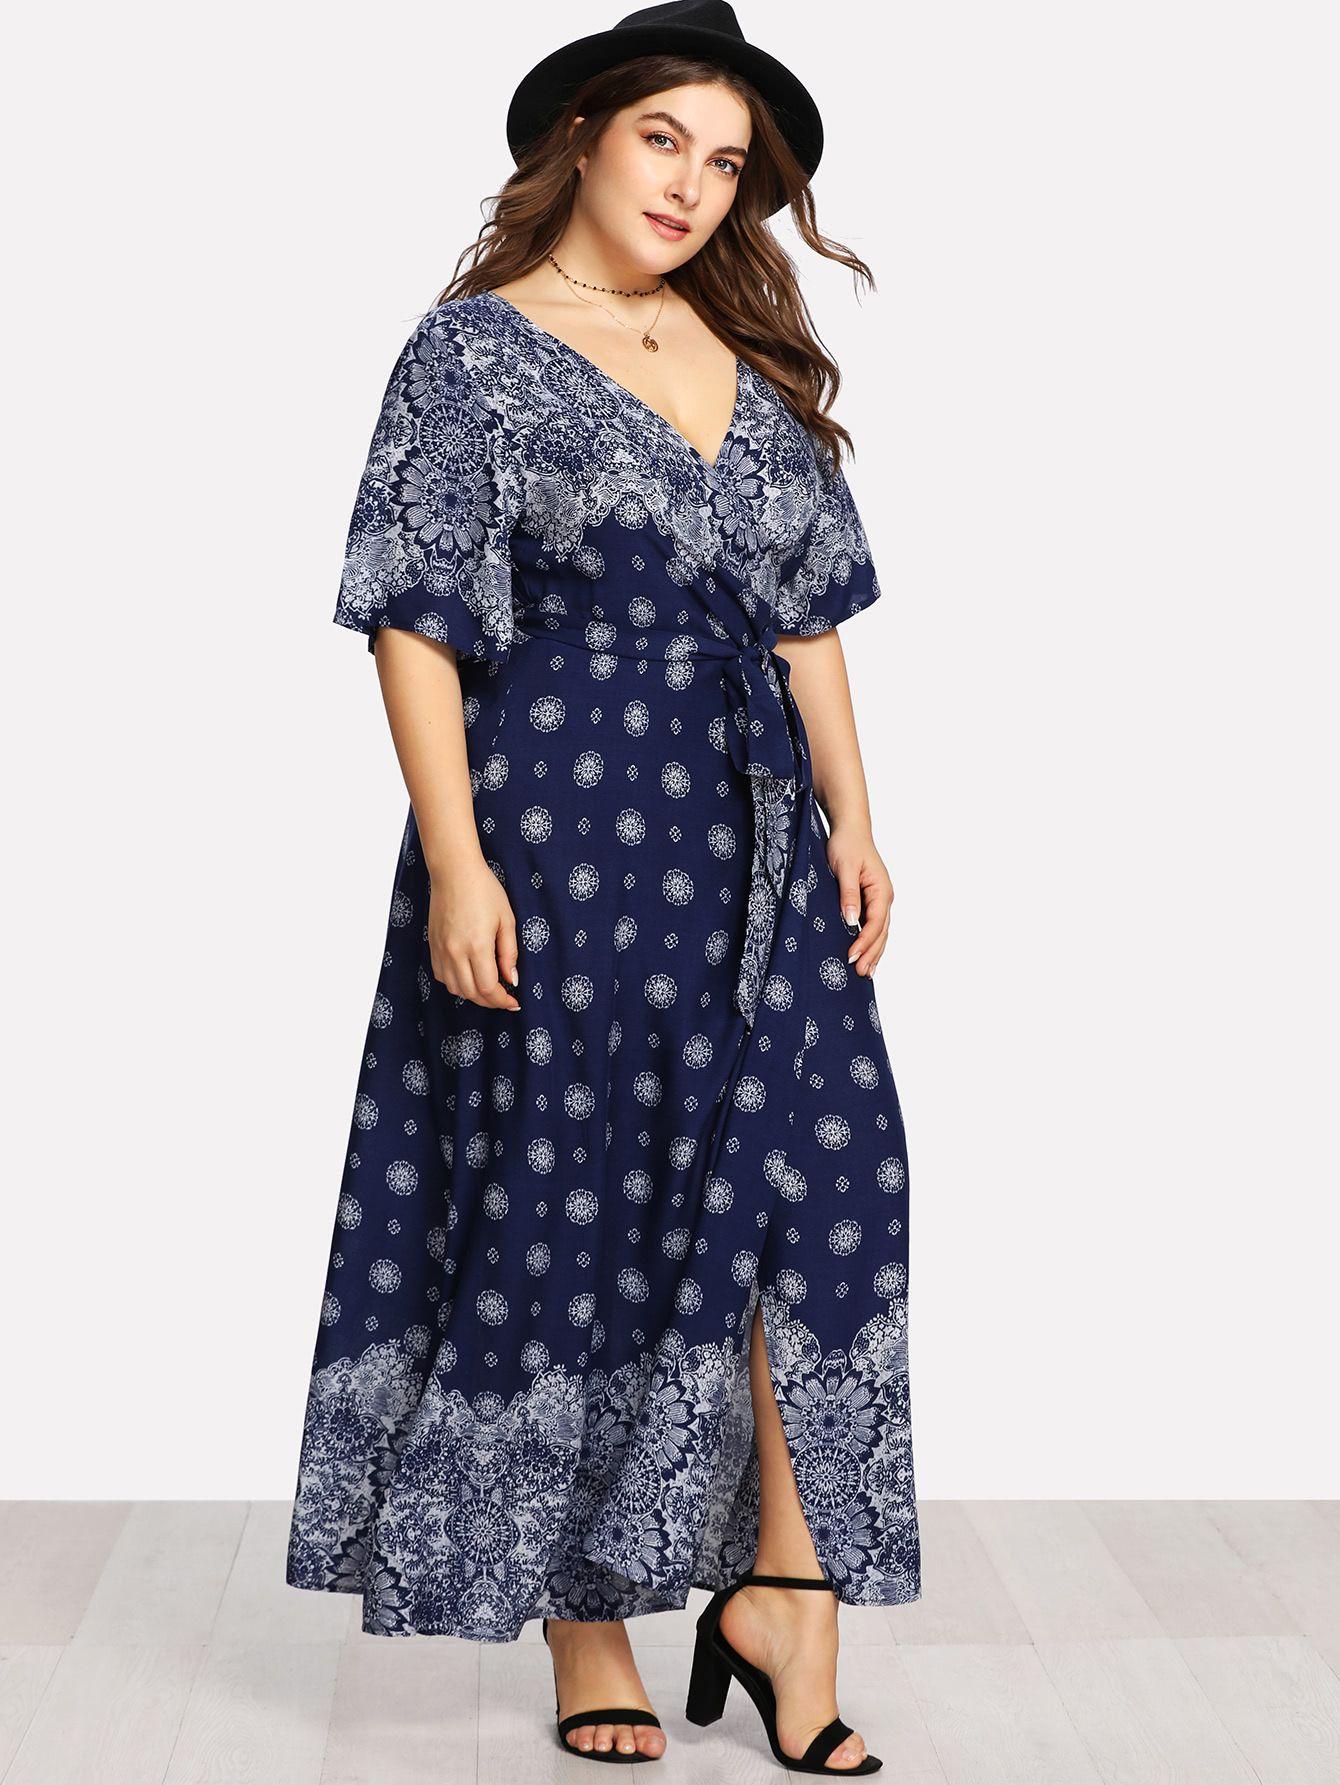 dc3643ddbb Shop Ornate Print Surplice Wrap Dress online. SheIn offers Ornate Print Surplice  Wrap Dress & more to fit your fashionable needs.